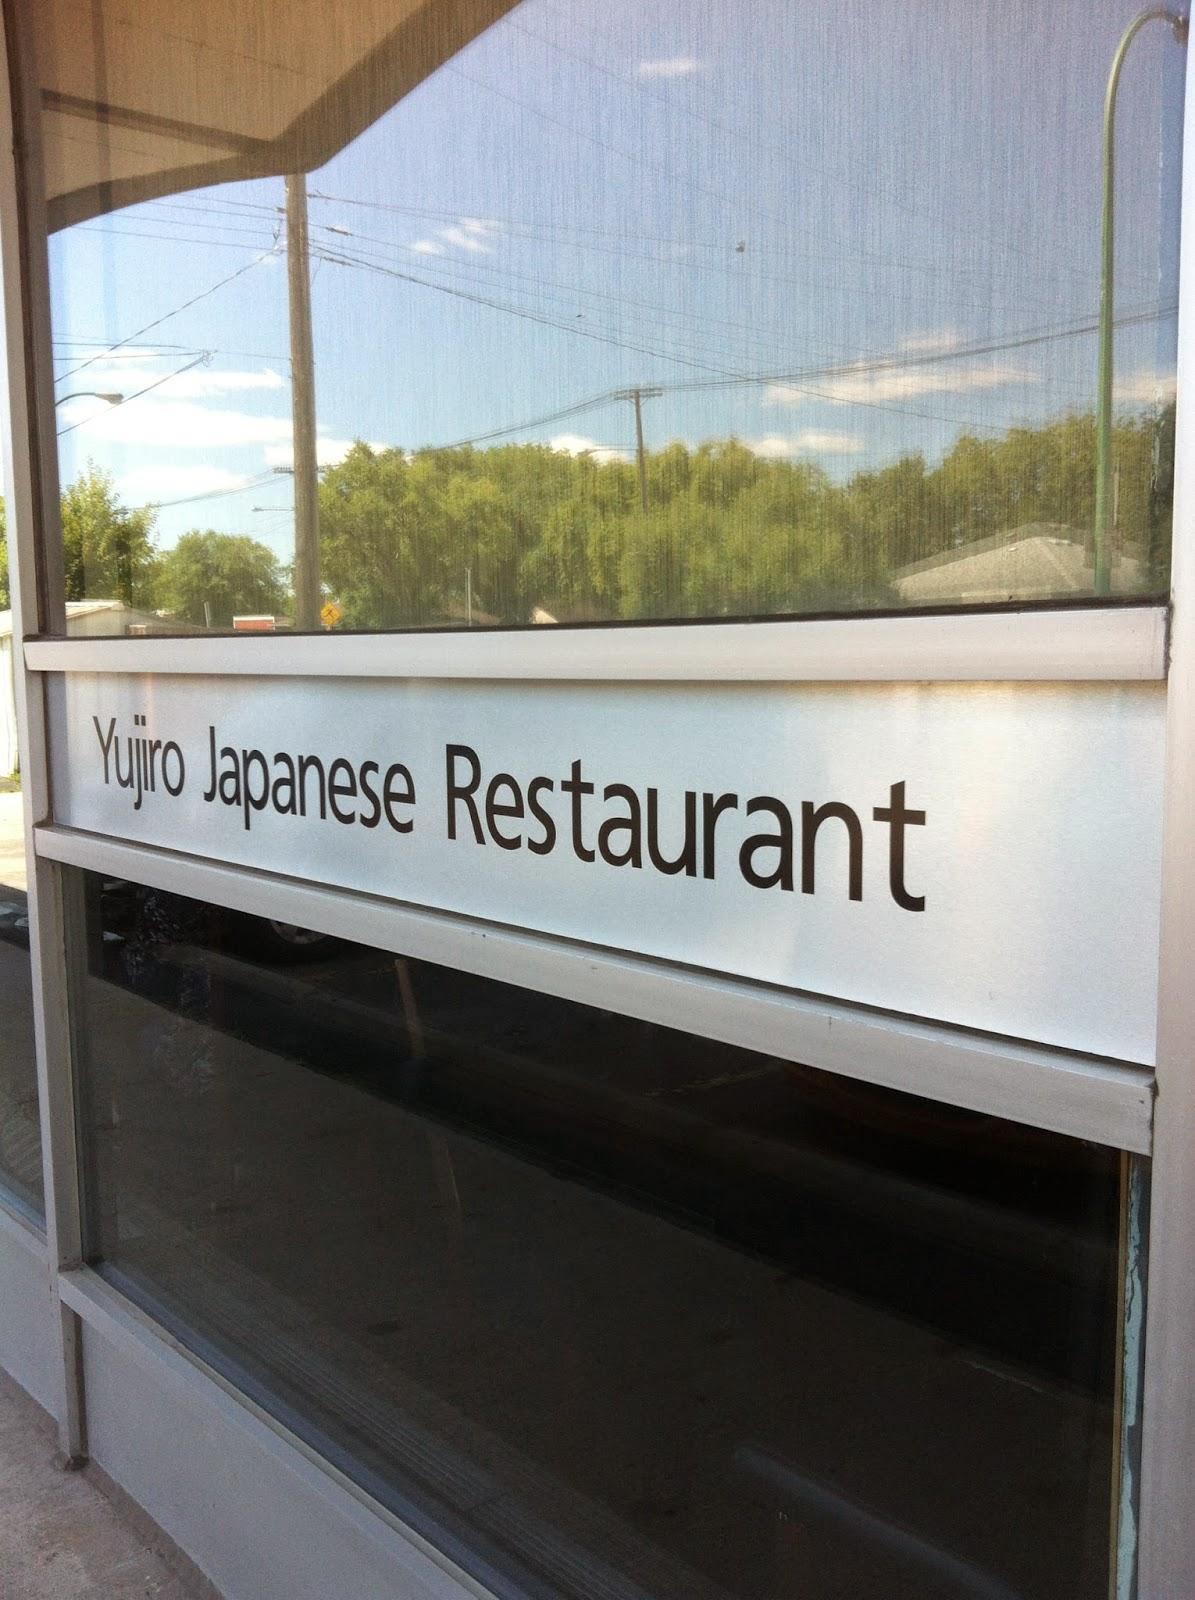 eating often blog yujiro japanese restaurant lunch. Black Bedroom Furniture Sets. Home Design Ideas